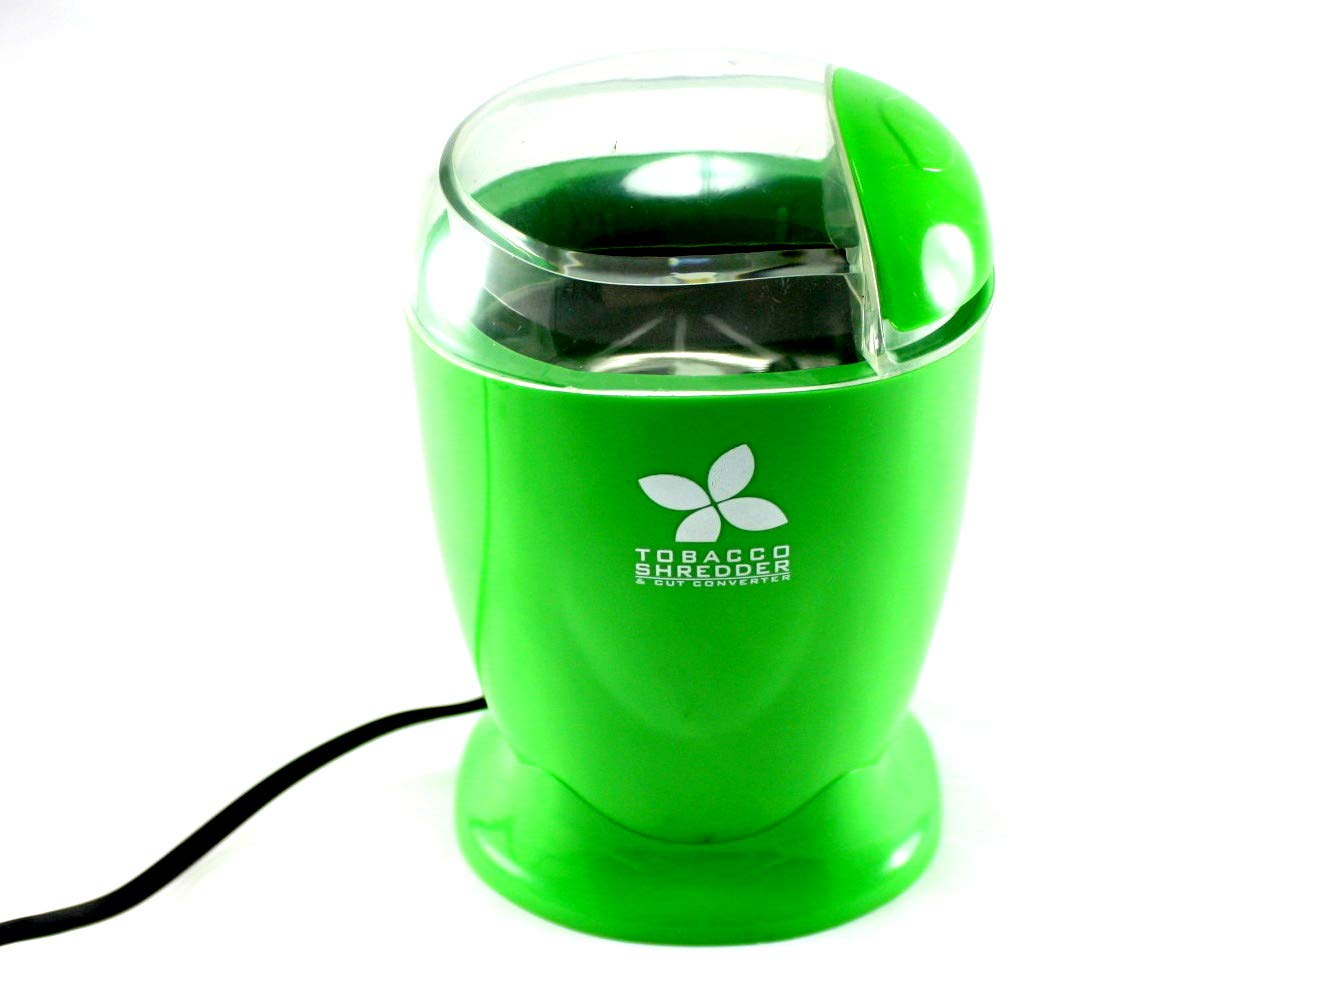 Electric Tobacco Shredder - Cutter - Converter by TSS